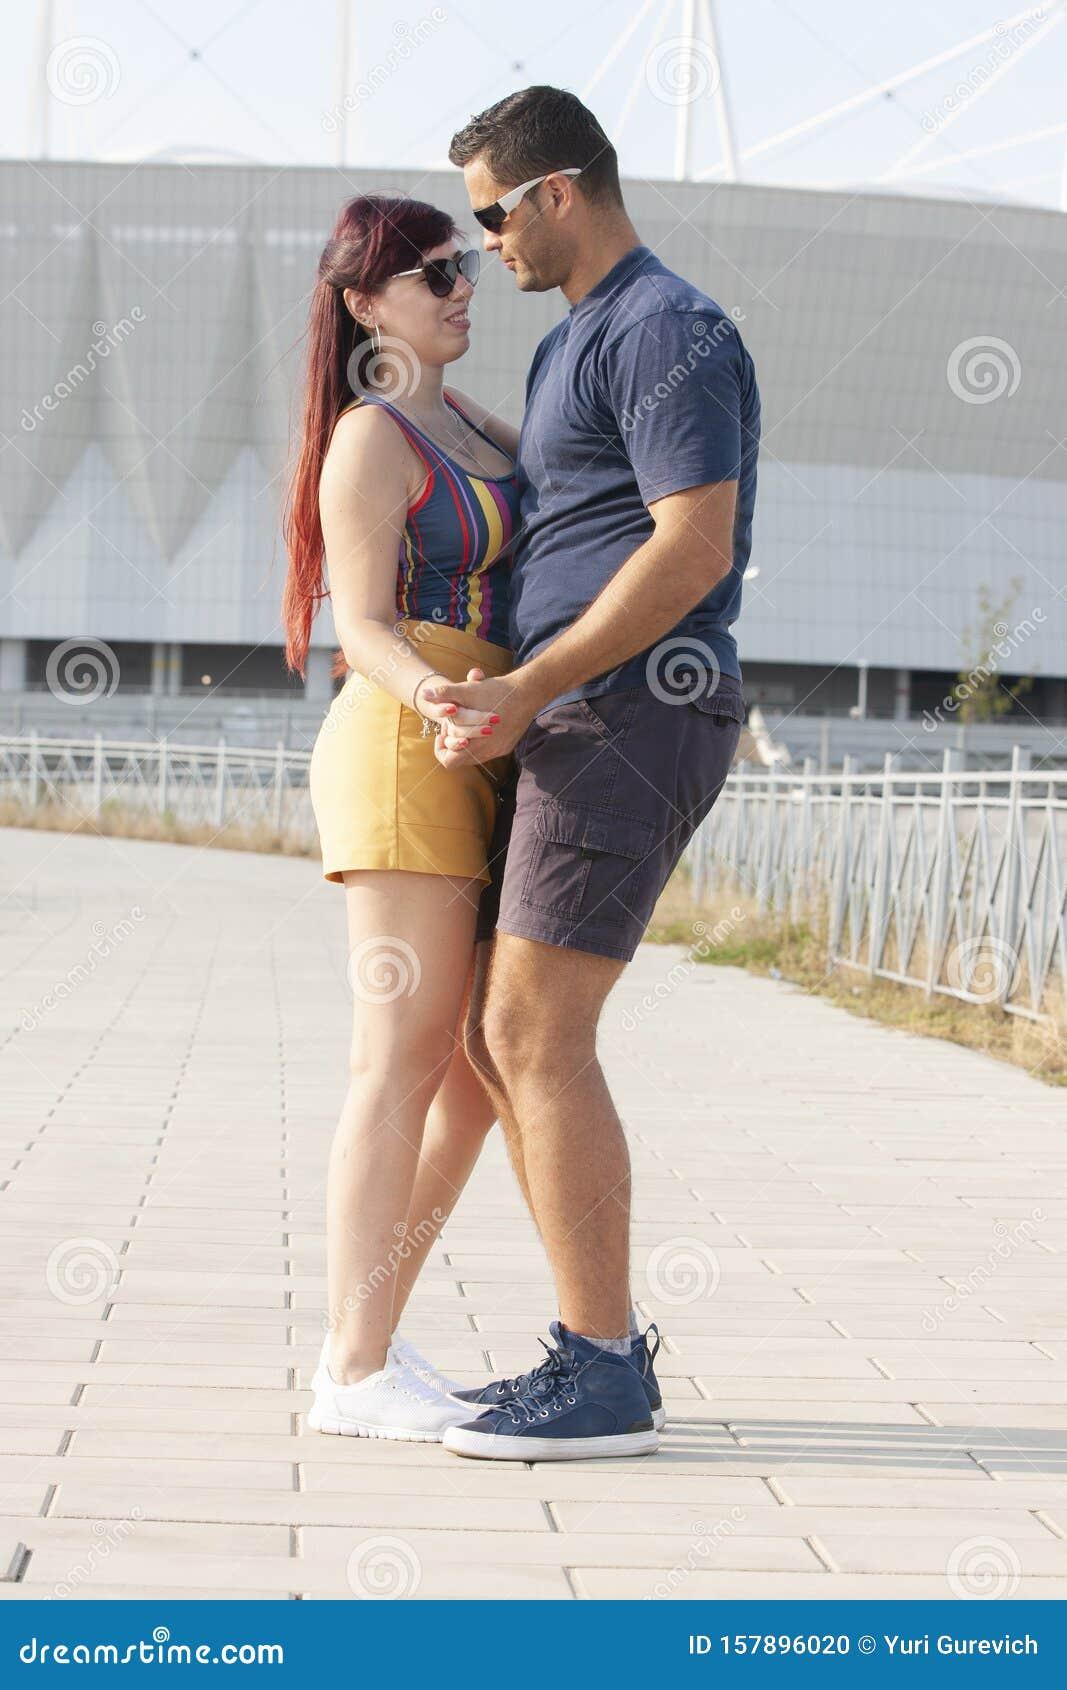 amy poehler dating 2017